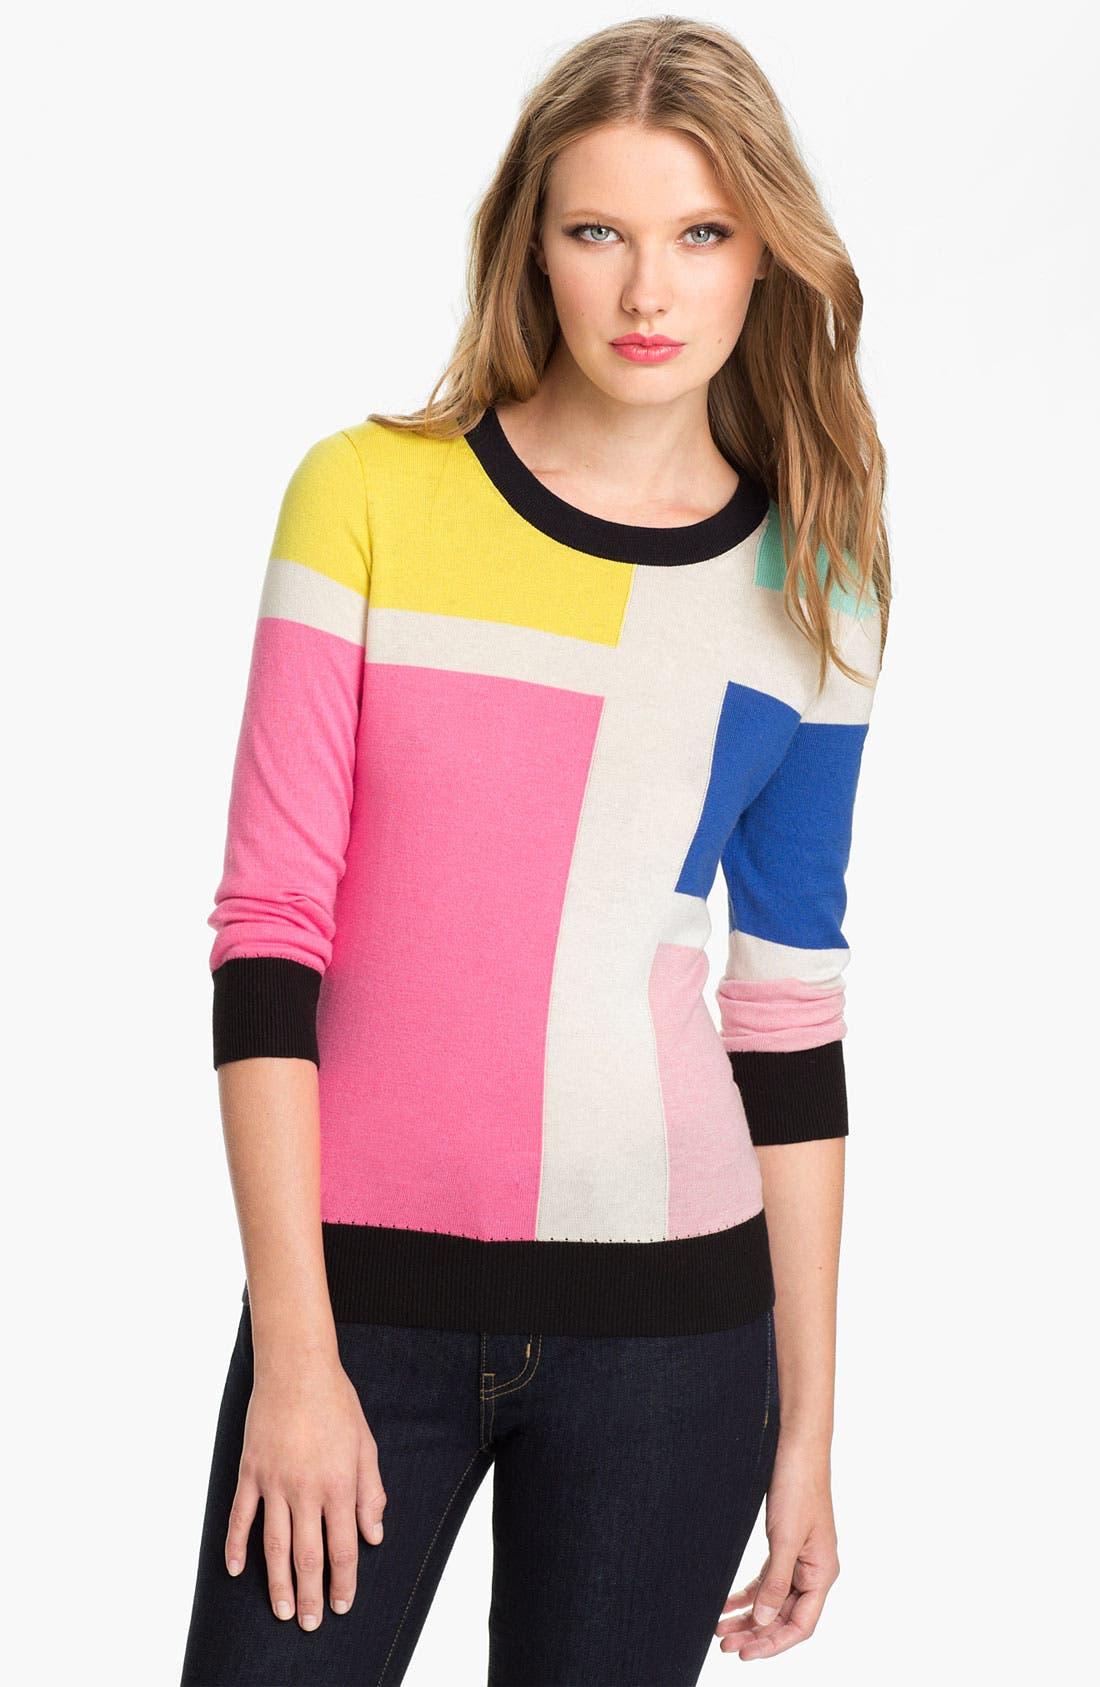 Main Image - kate spade new york 'meri' sweater